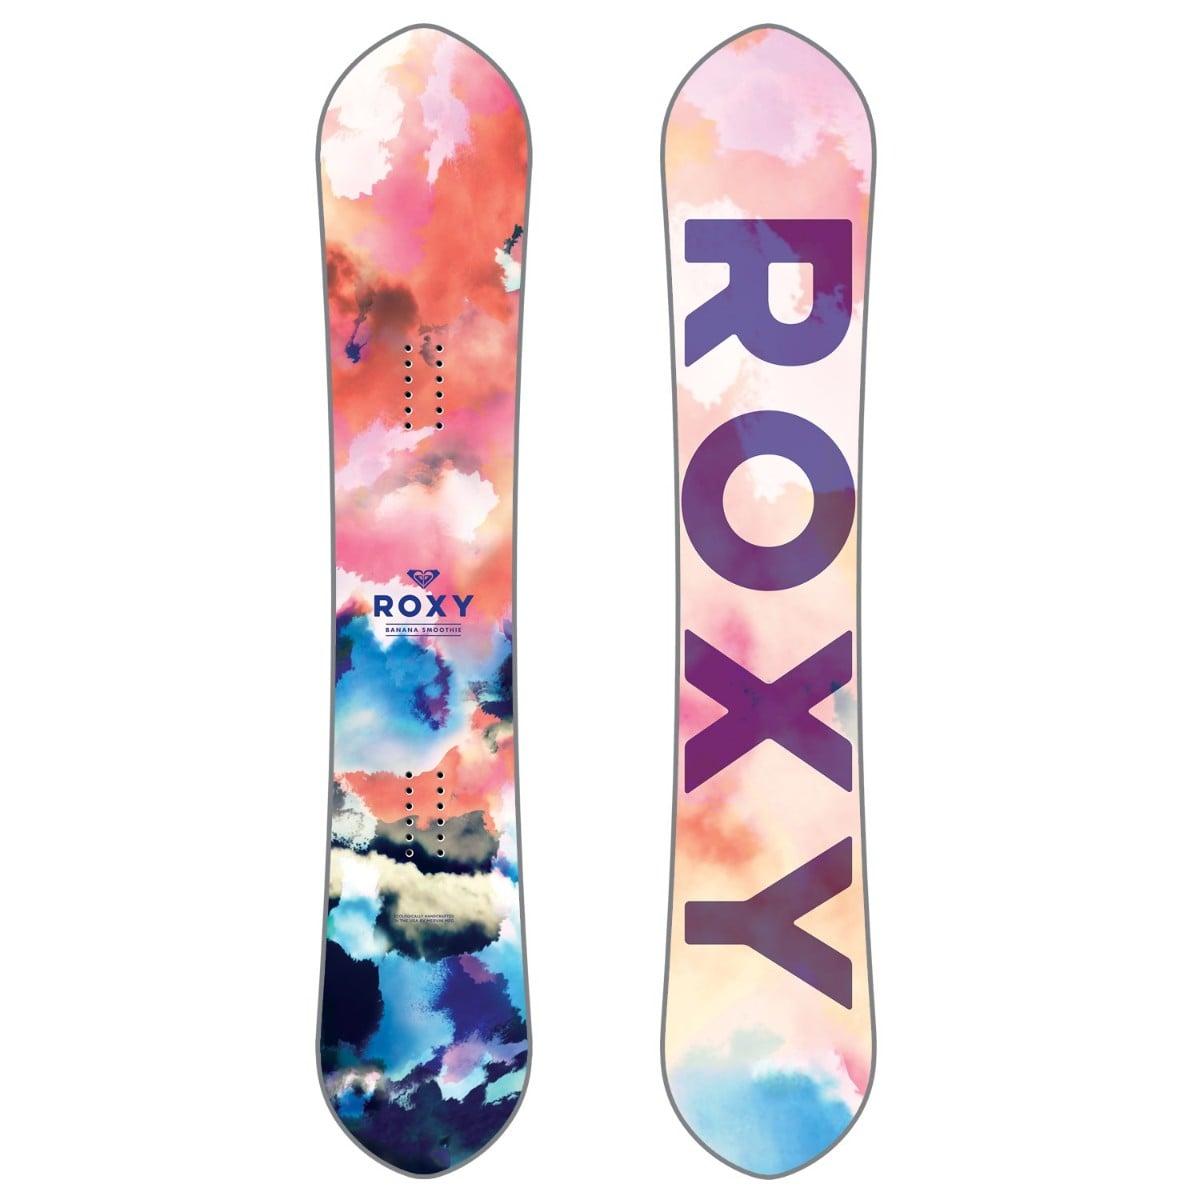 Roxy 2018 Banana Smoothie C2e Women's Snowboard Review